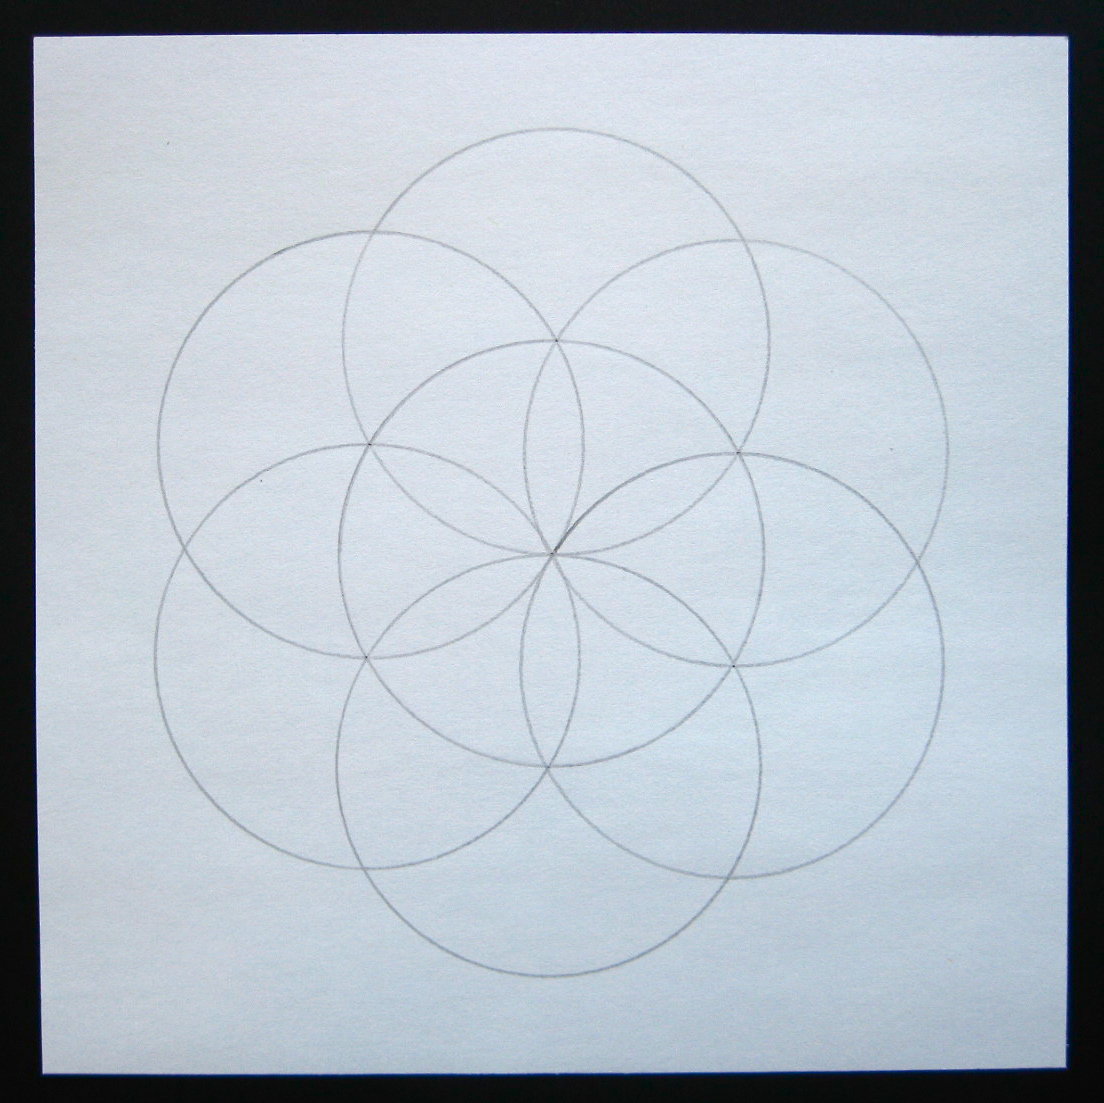 Compass Mandalas Teachkidsart